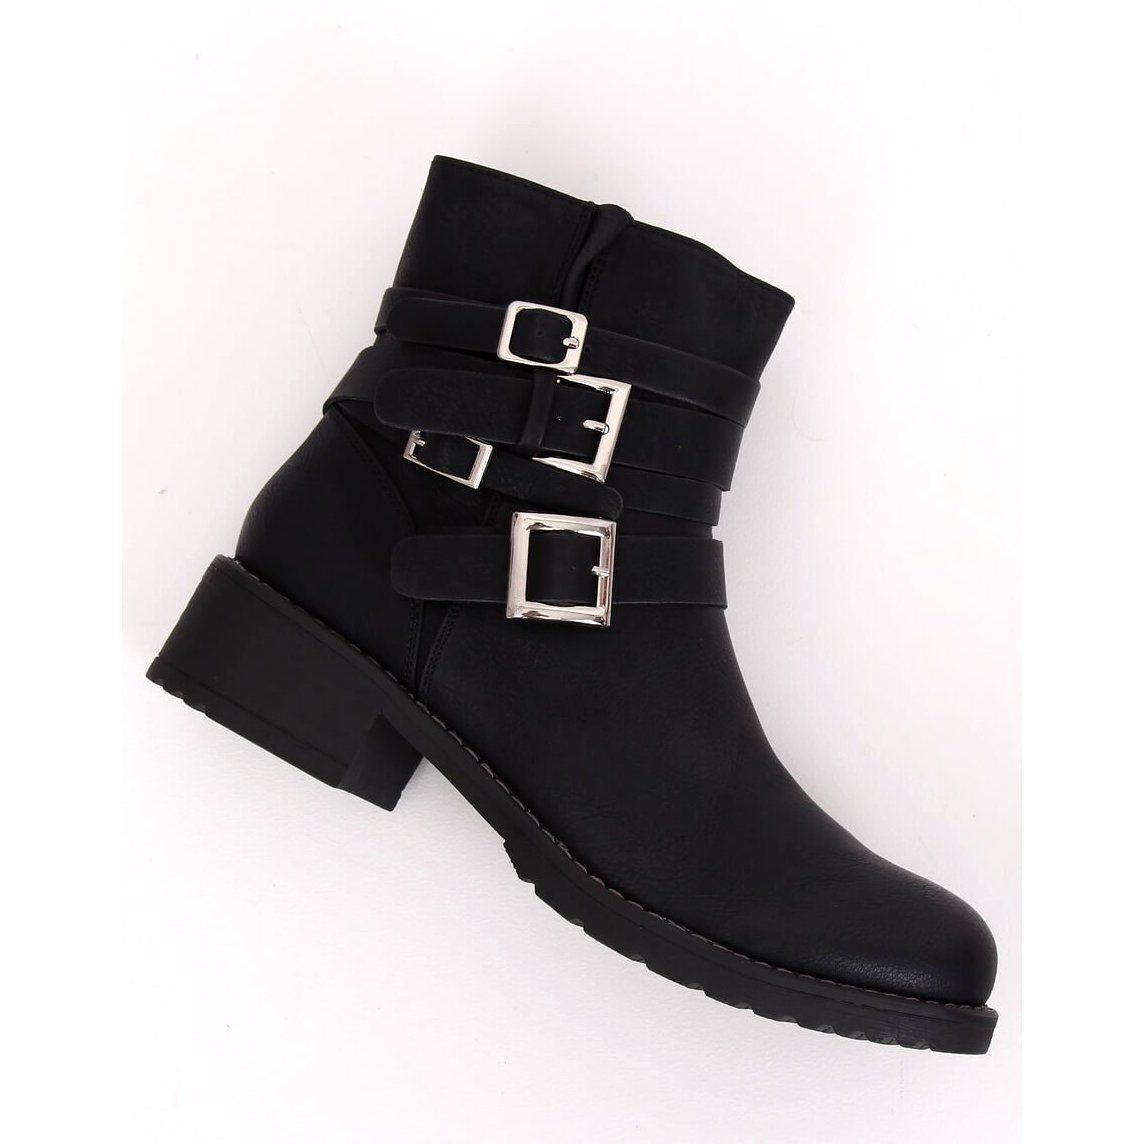 Botki Damskie Plaskie Czarne Z100 Black Boots Womens Black Flats Black Flat Boots